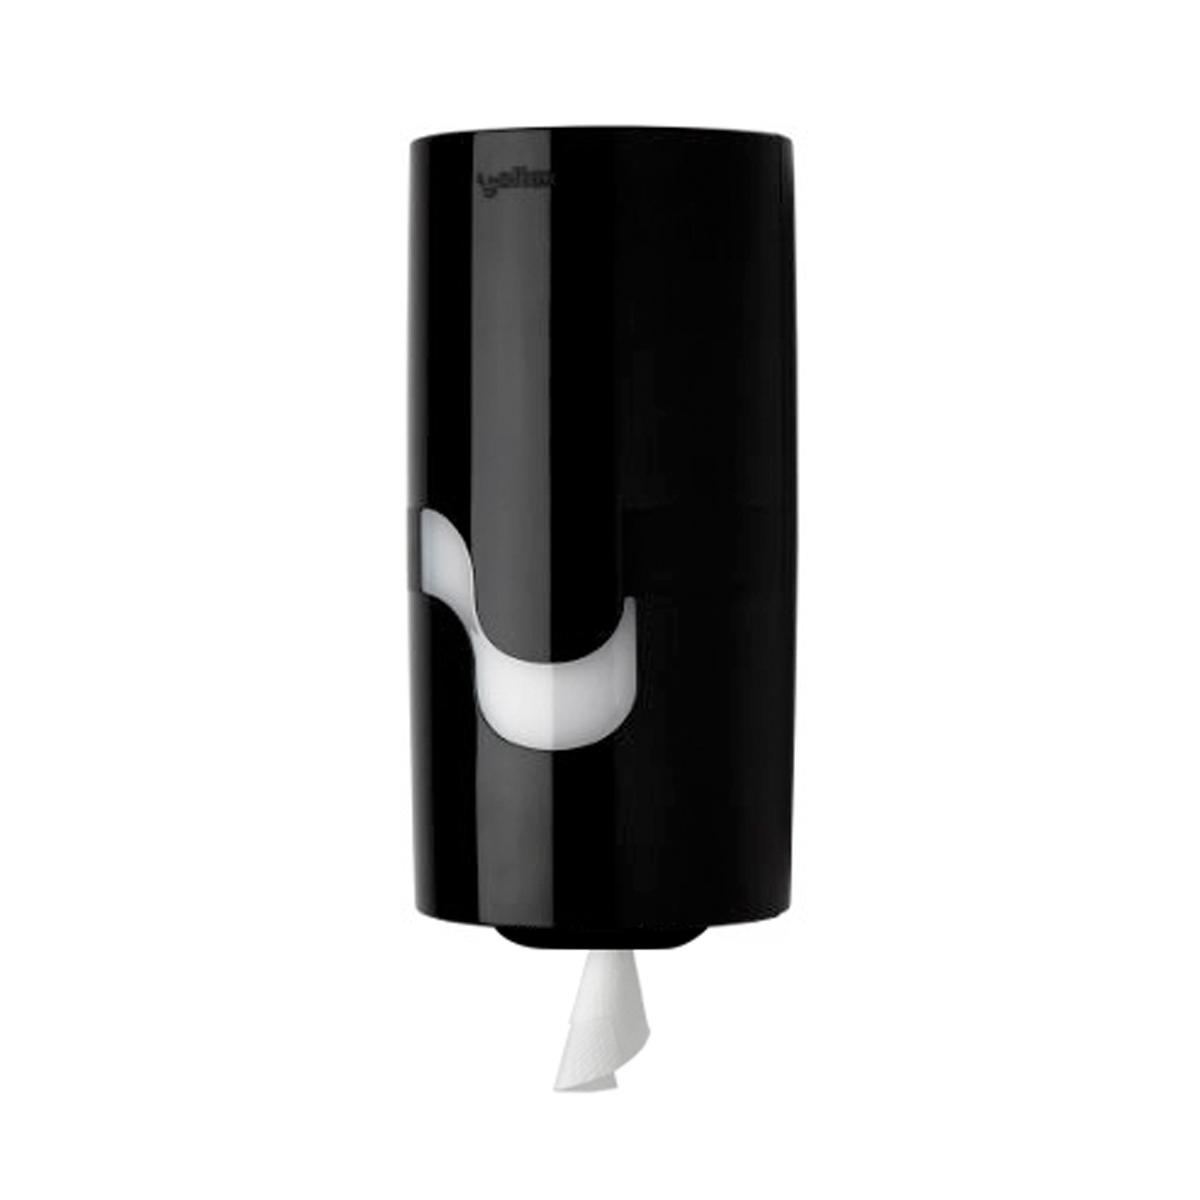 Handtuchrollenspender mini perfo Box schwarz